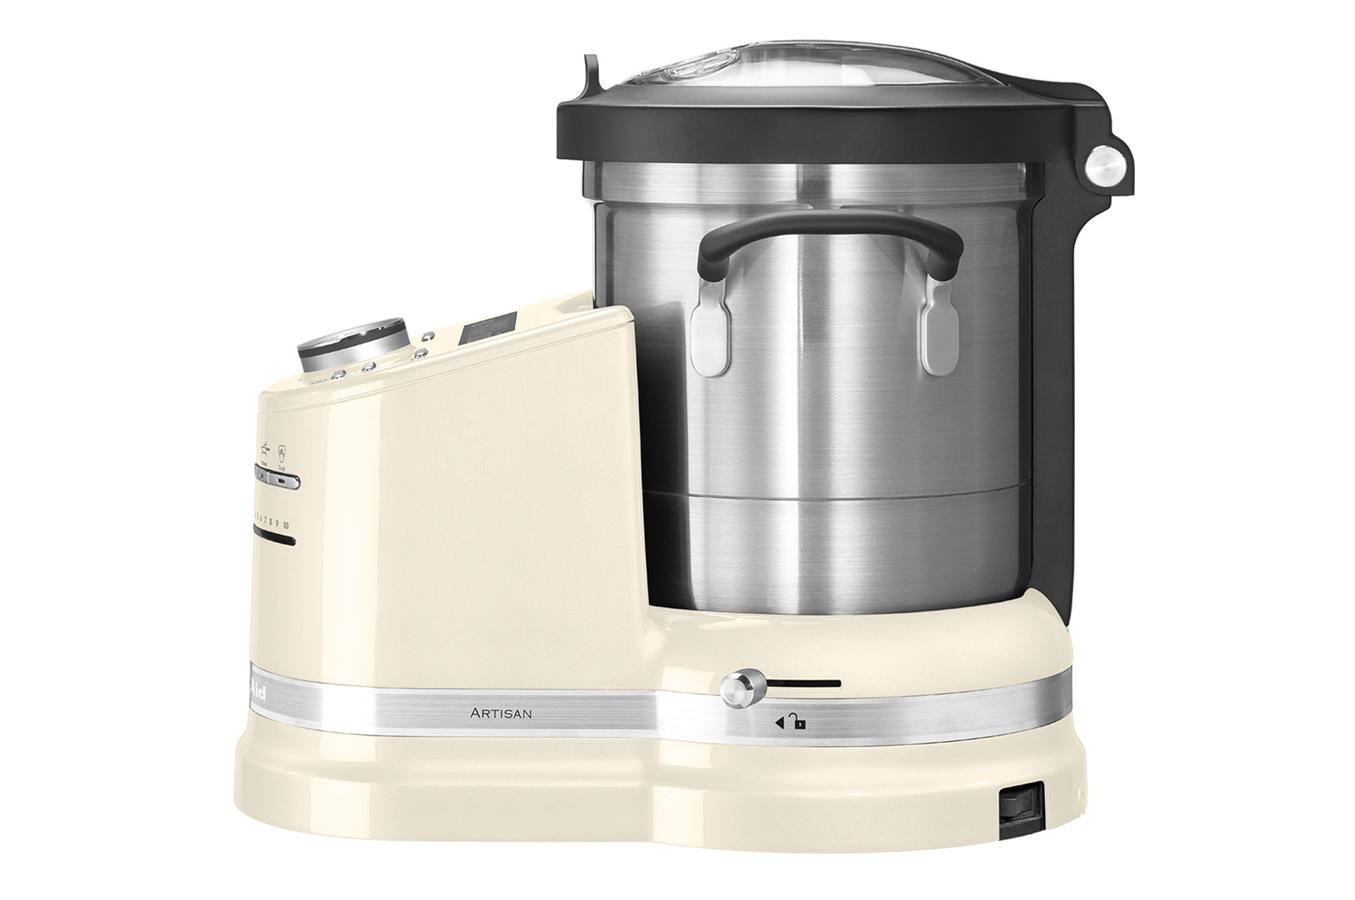 robot cuiseur kitchenaid 5kcf0103eac 5 cook processor creme 5kcf0103eac 5 cook processor creme. Black Bedroom Furniture Sets. Home Design Ideas